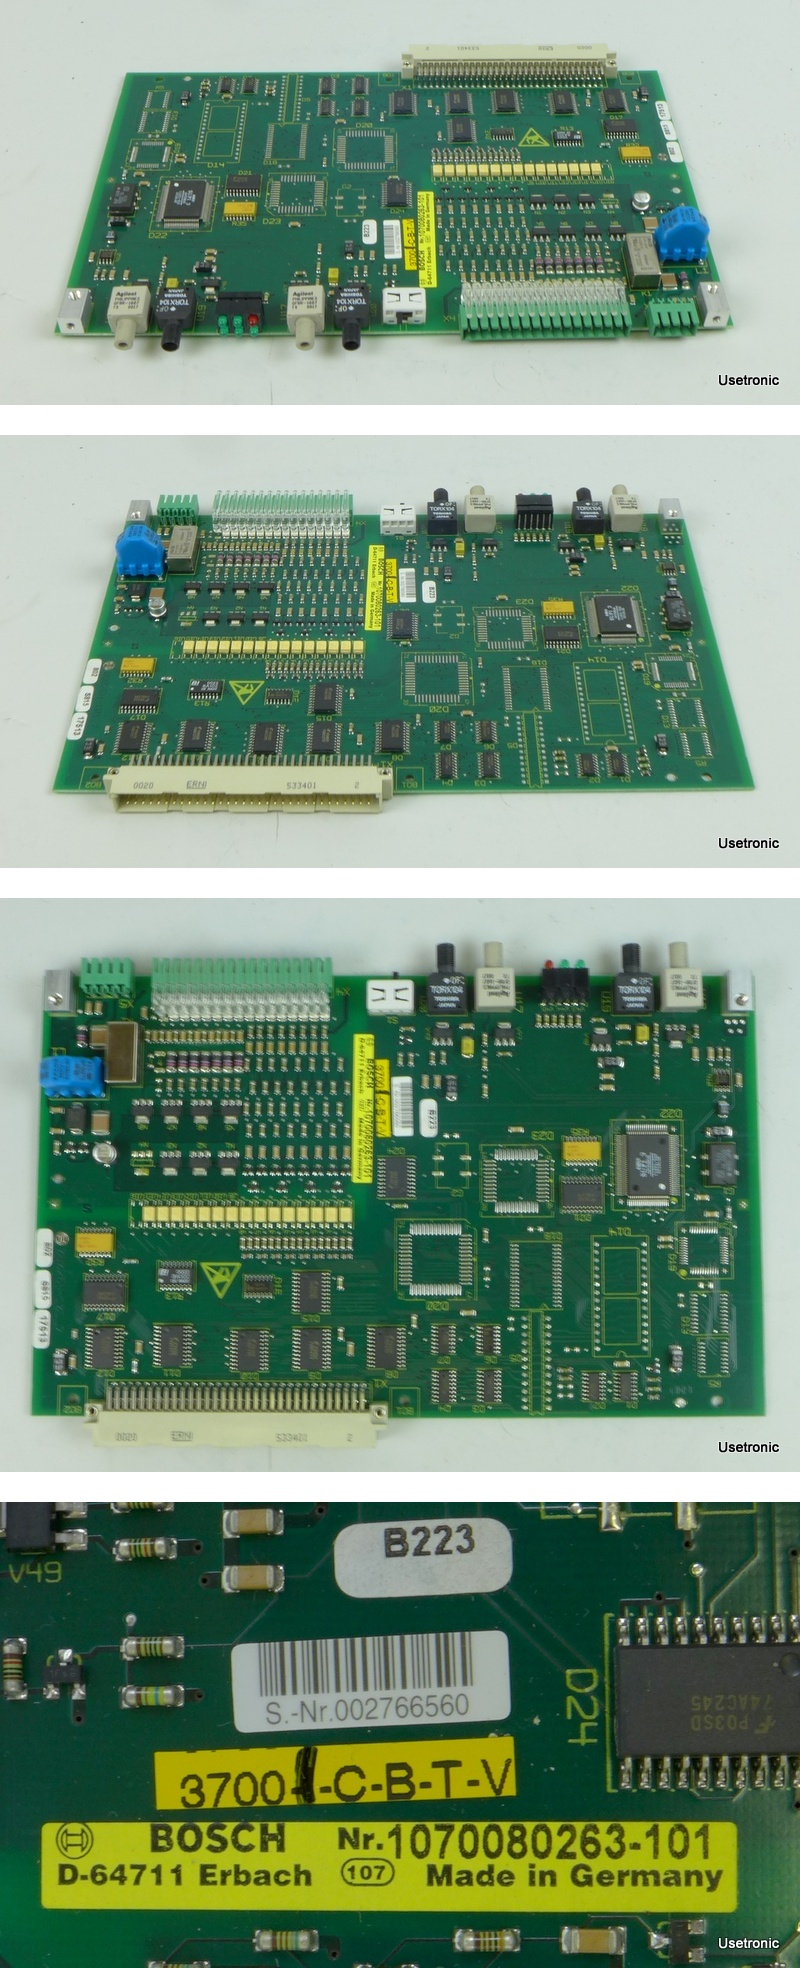 Bosch 1070080263-101 PSI 6100.330